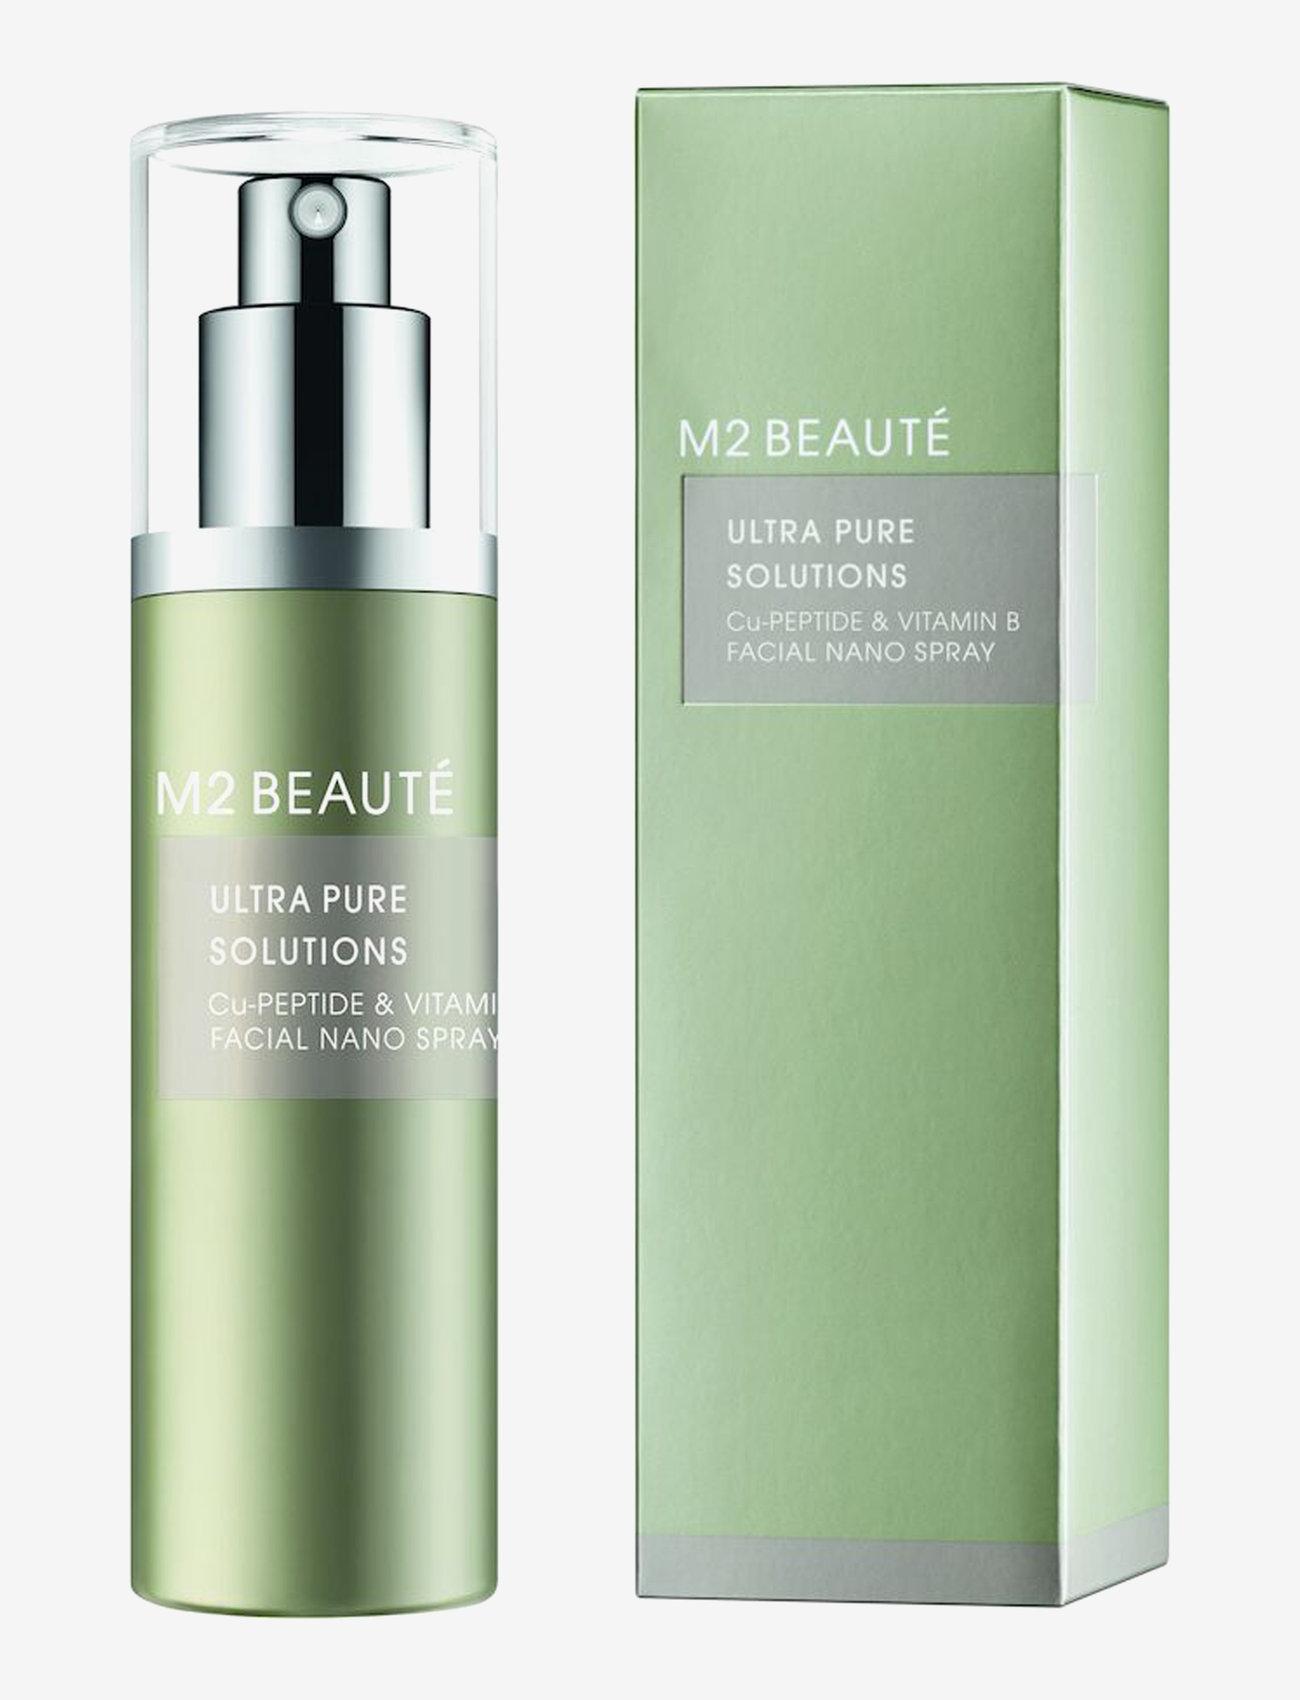 M2 Beauté - Cu-Peptide & Vitamin B Facial Nano Spray - setting spray - clear - 0